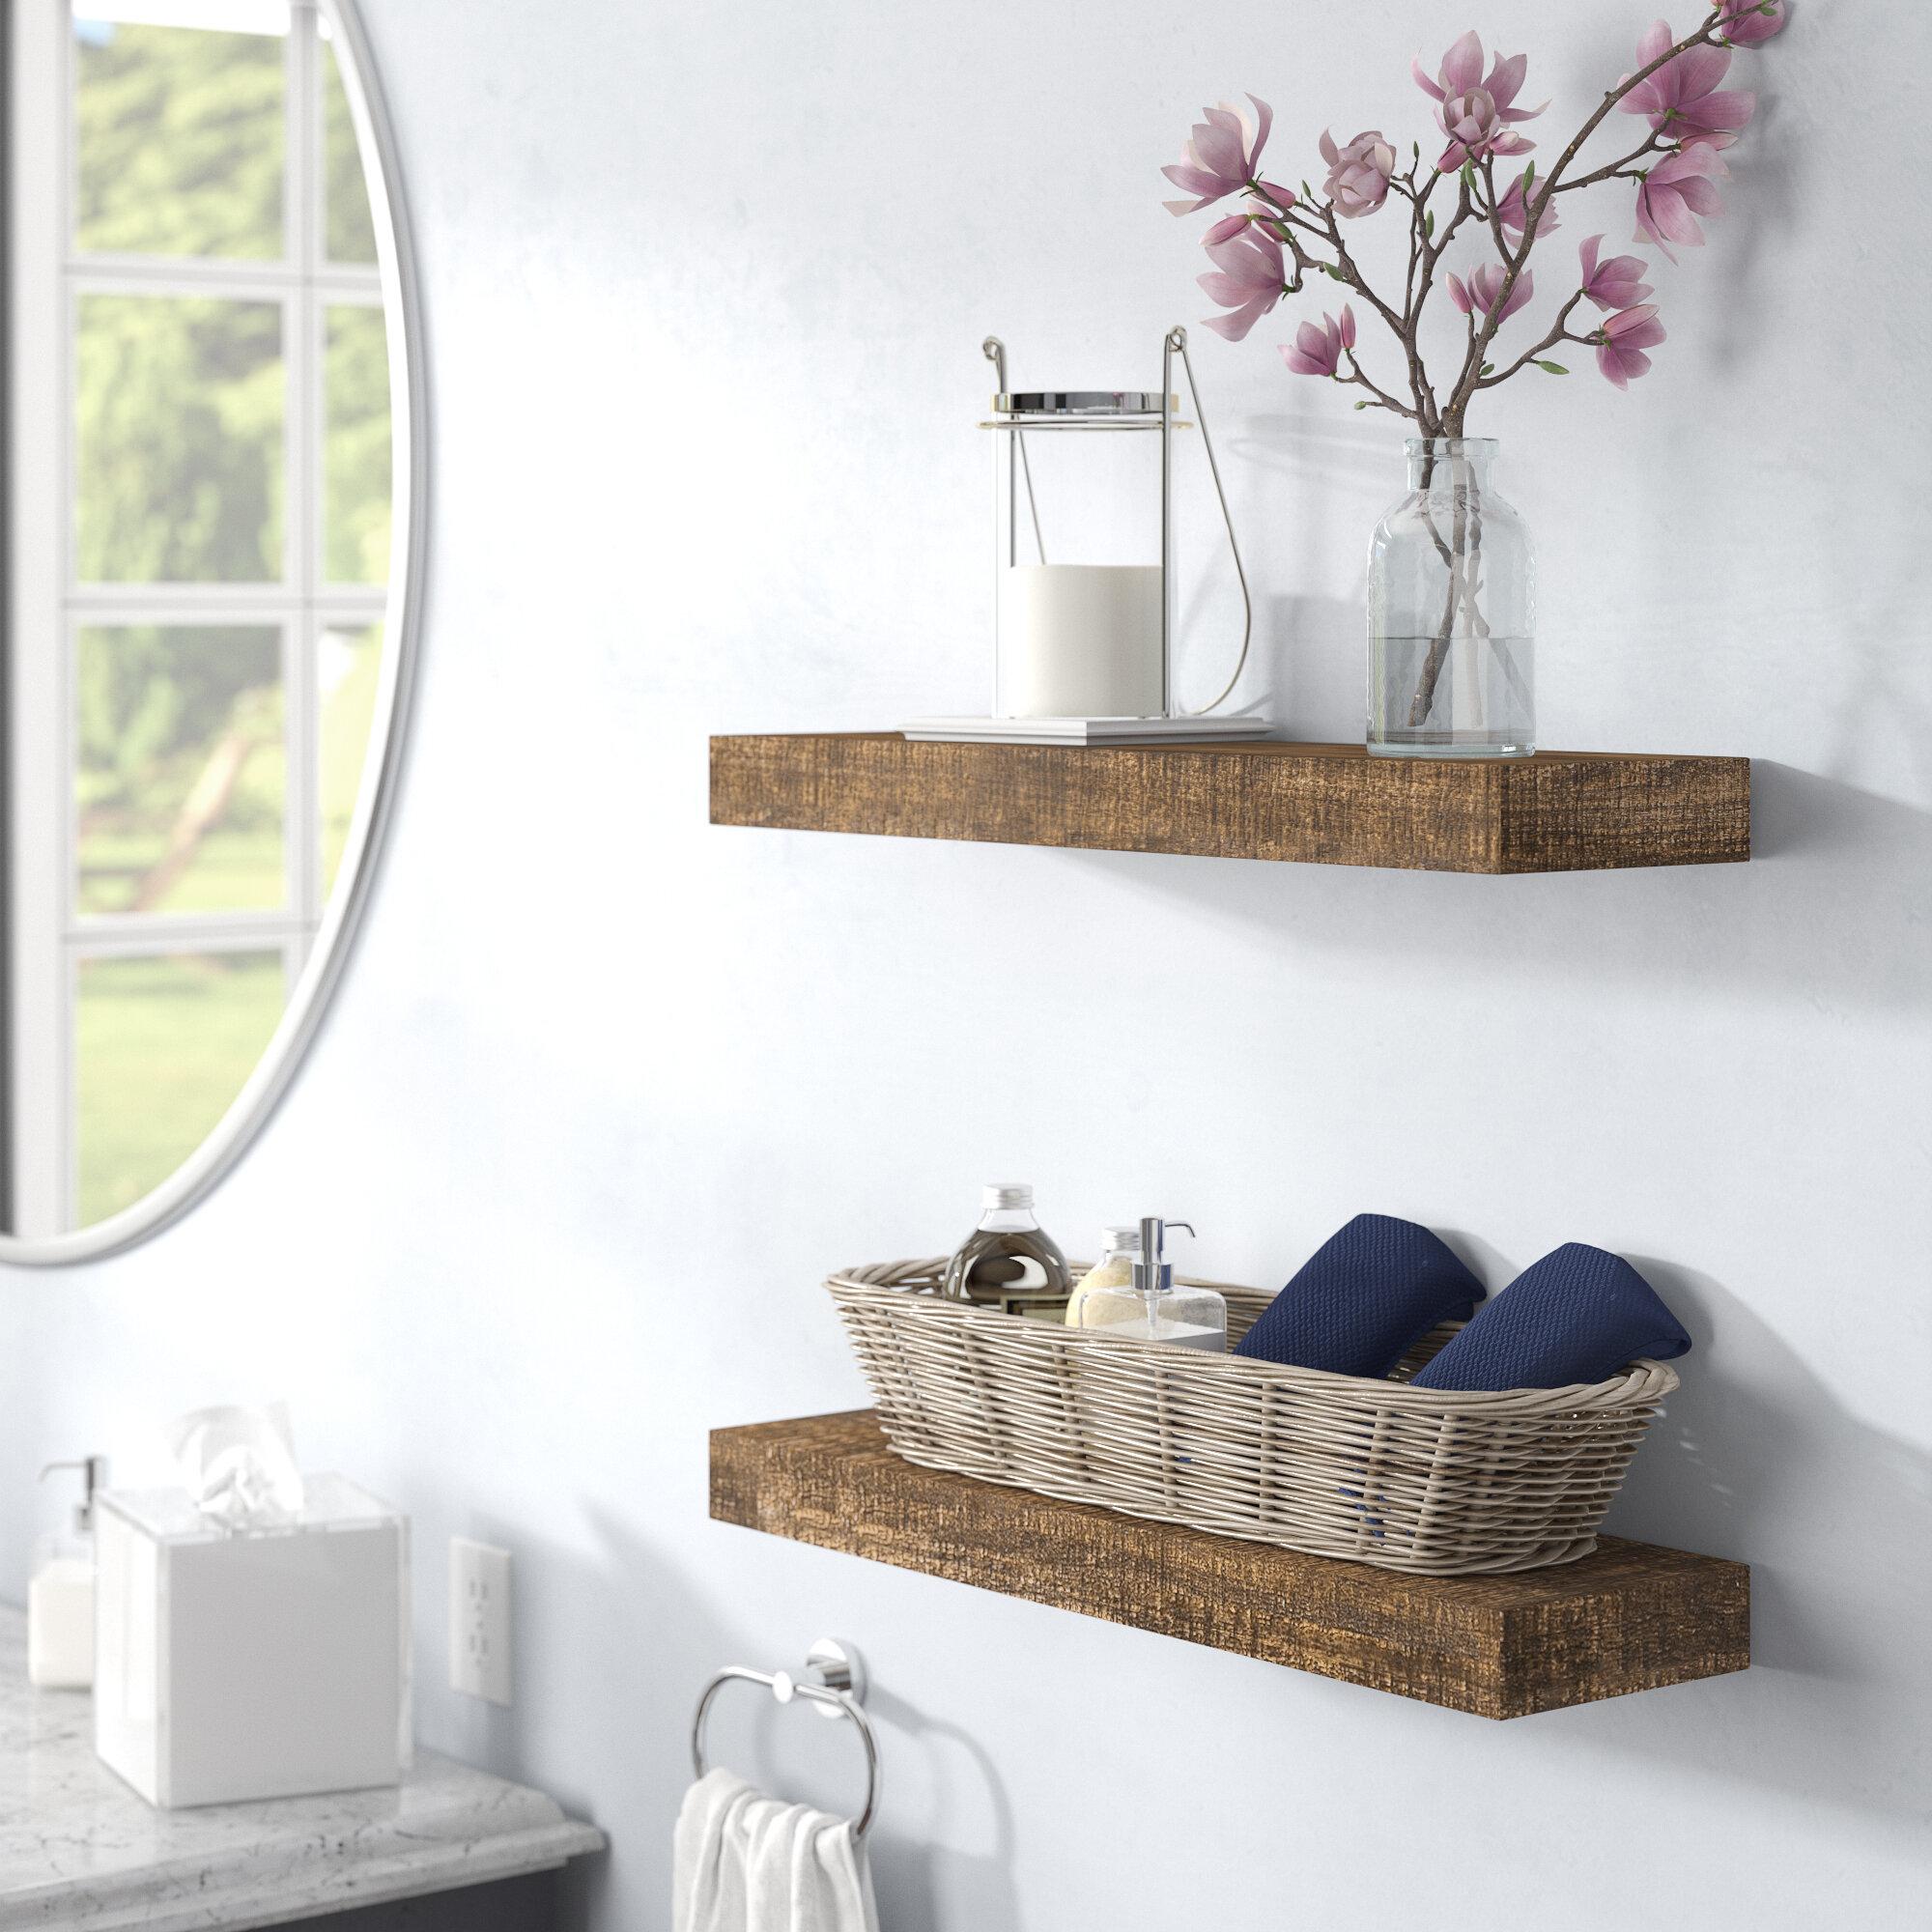 2 Piece Solid Wood Pine Floating Shelf